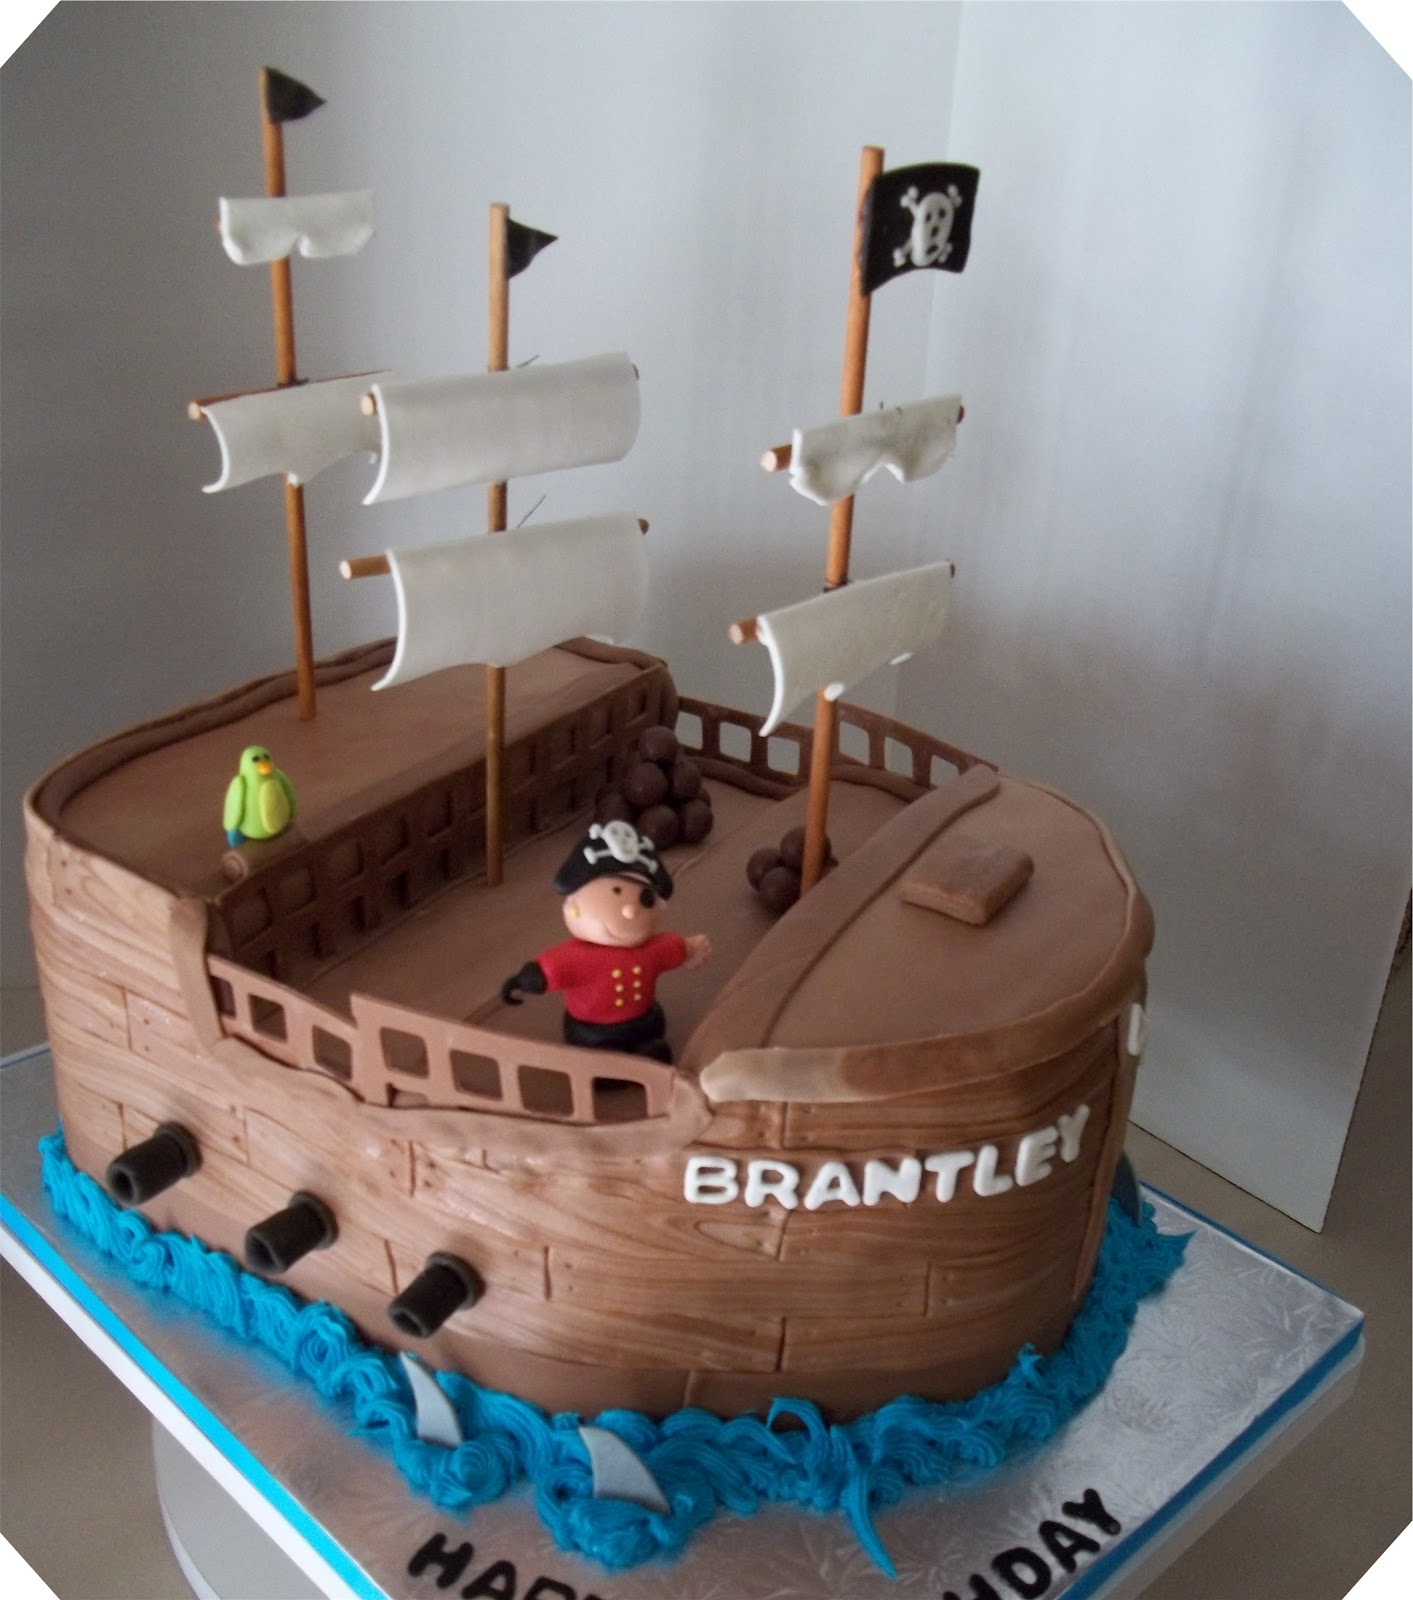 Bobbies Cakes And Cookies A Pirate Ship Cake Arrrrrgh